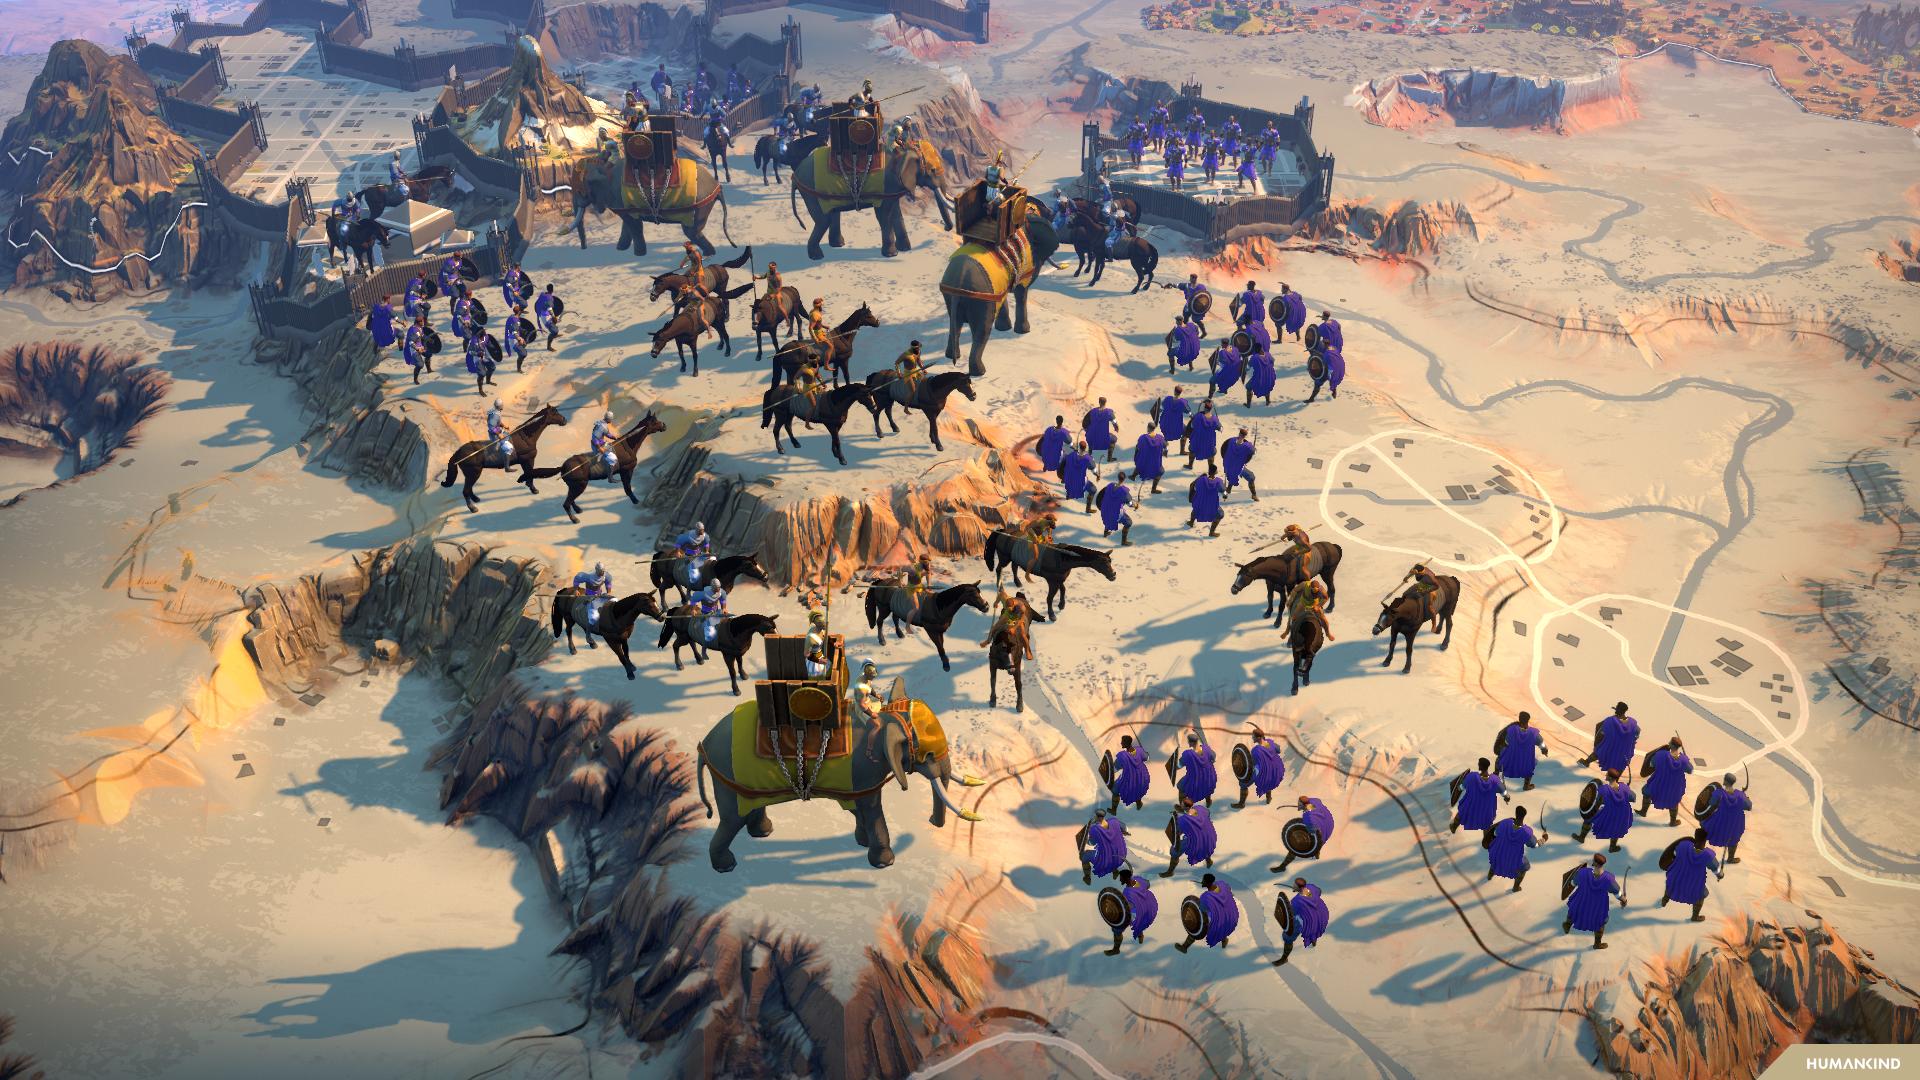 Humankind - safarigames